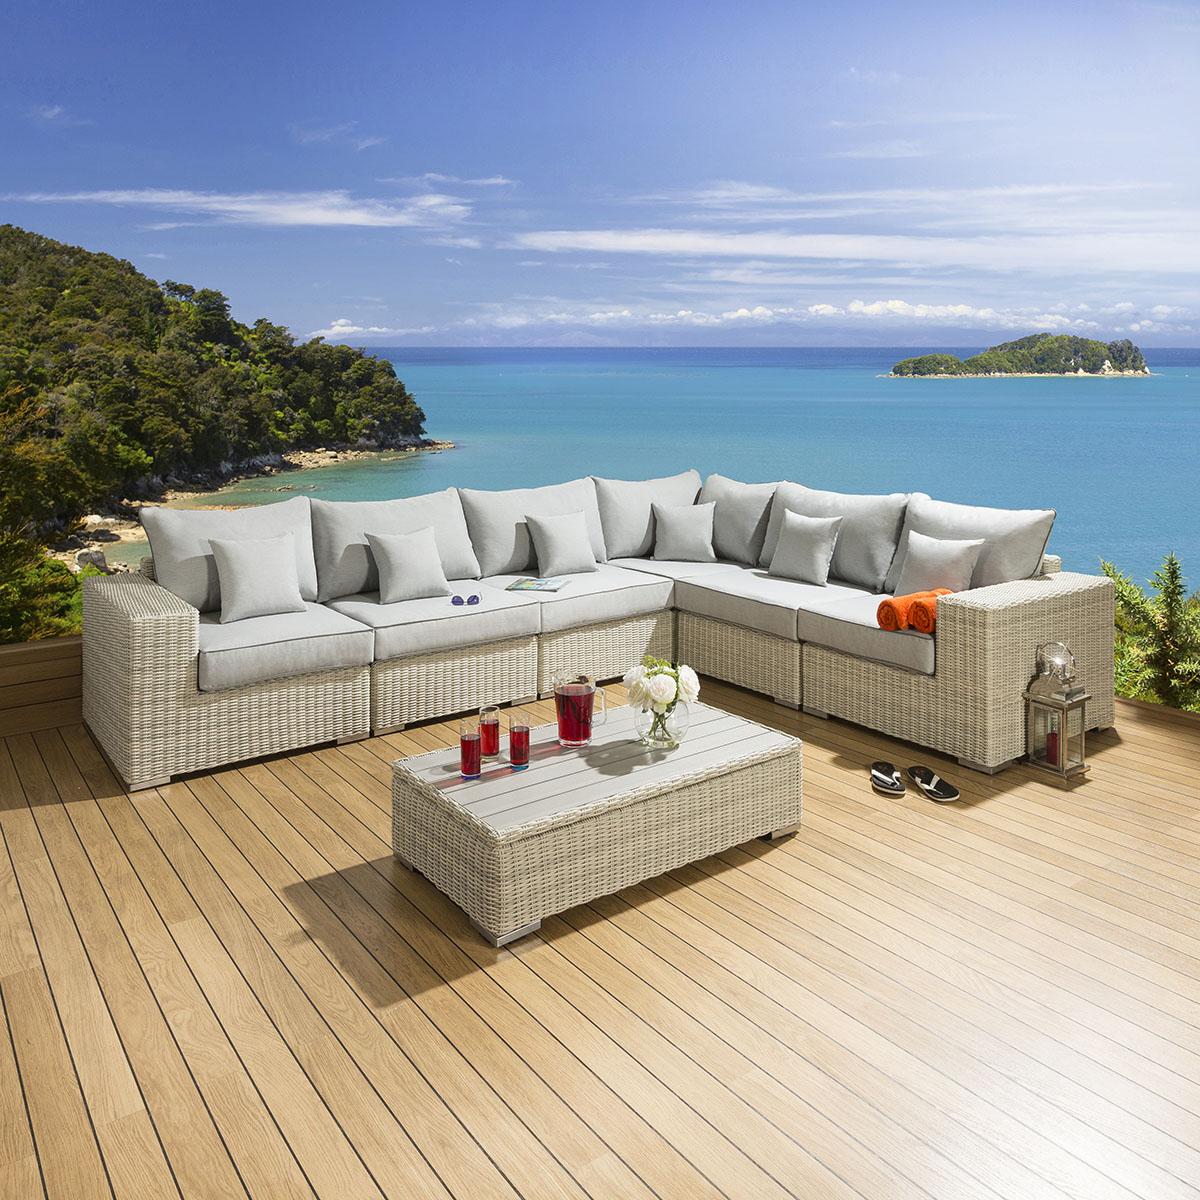 corner sofas for conservatories mage recliner sofa garden conservatory furniture set group stone